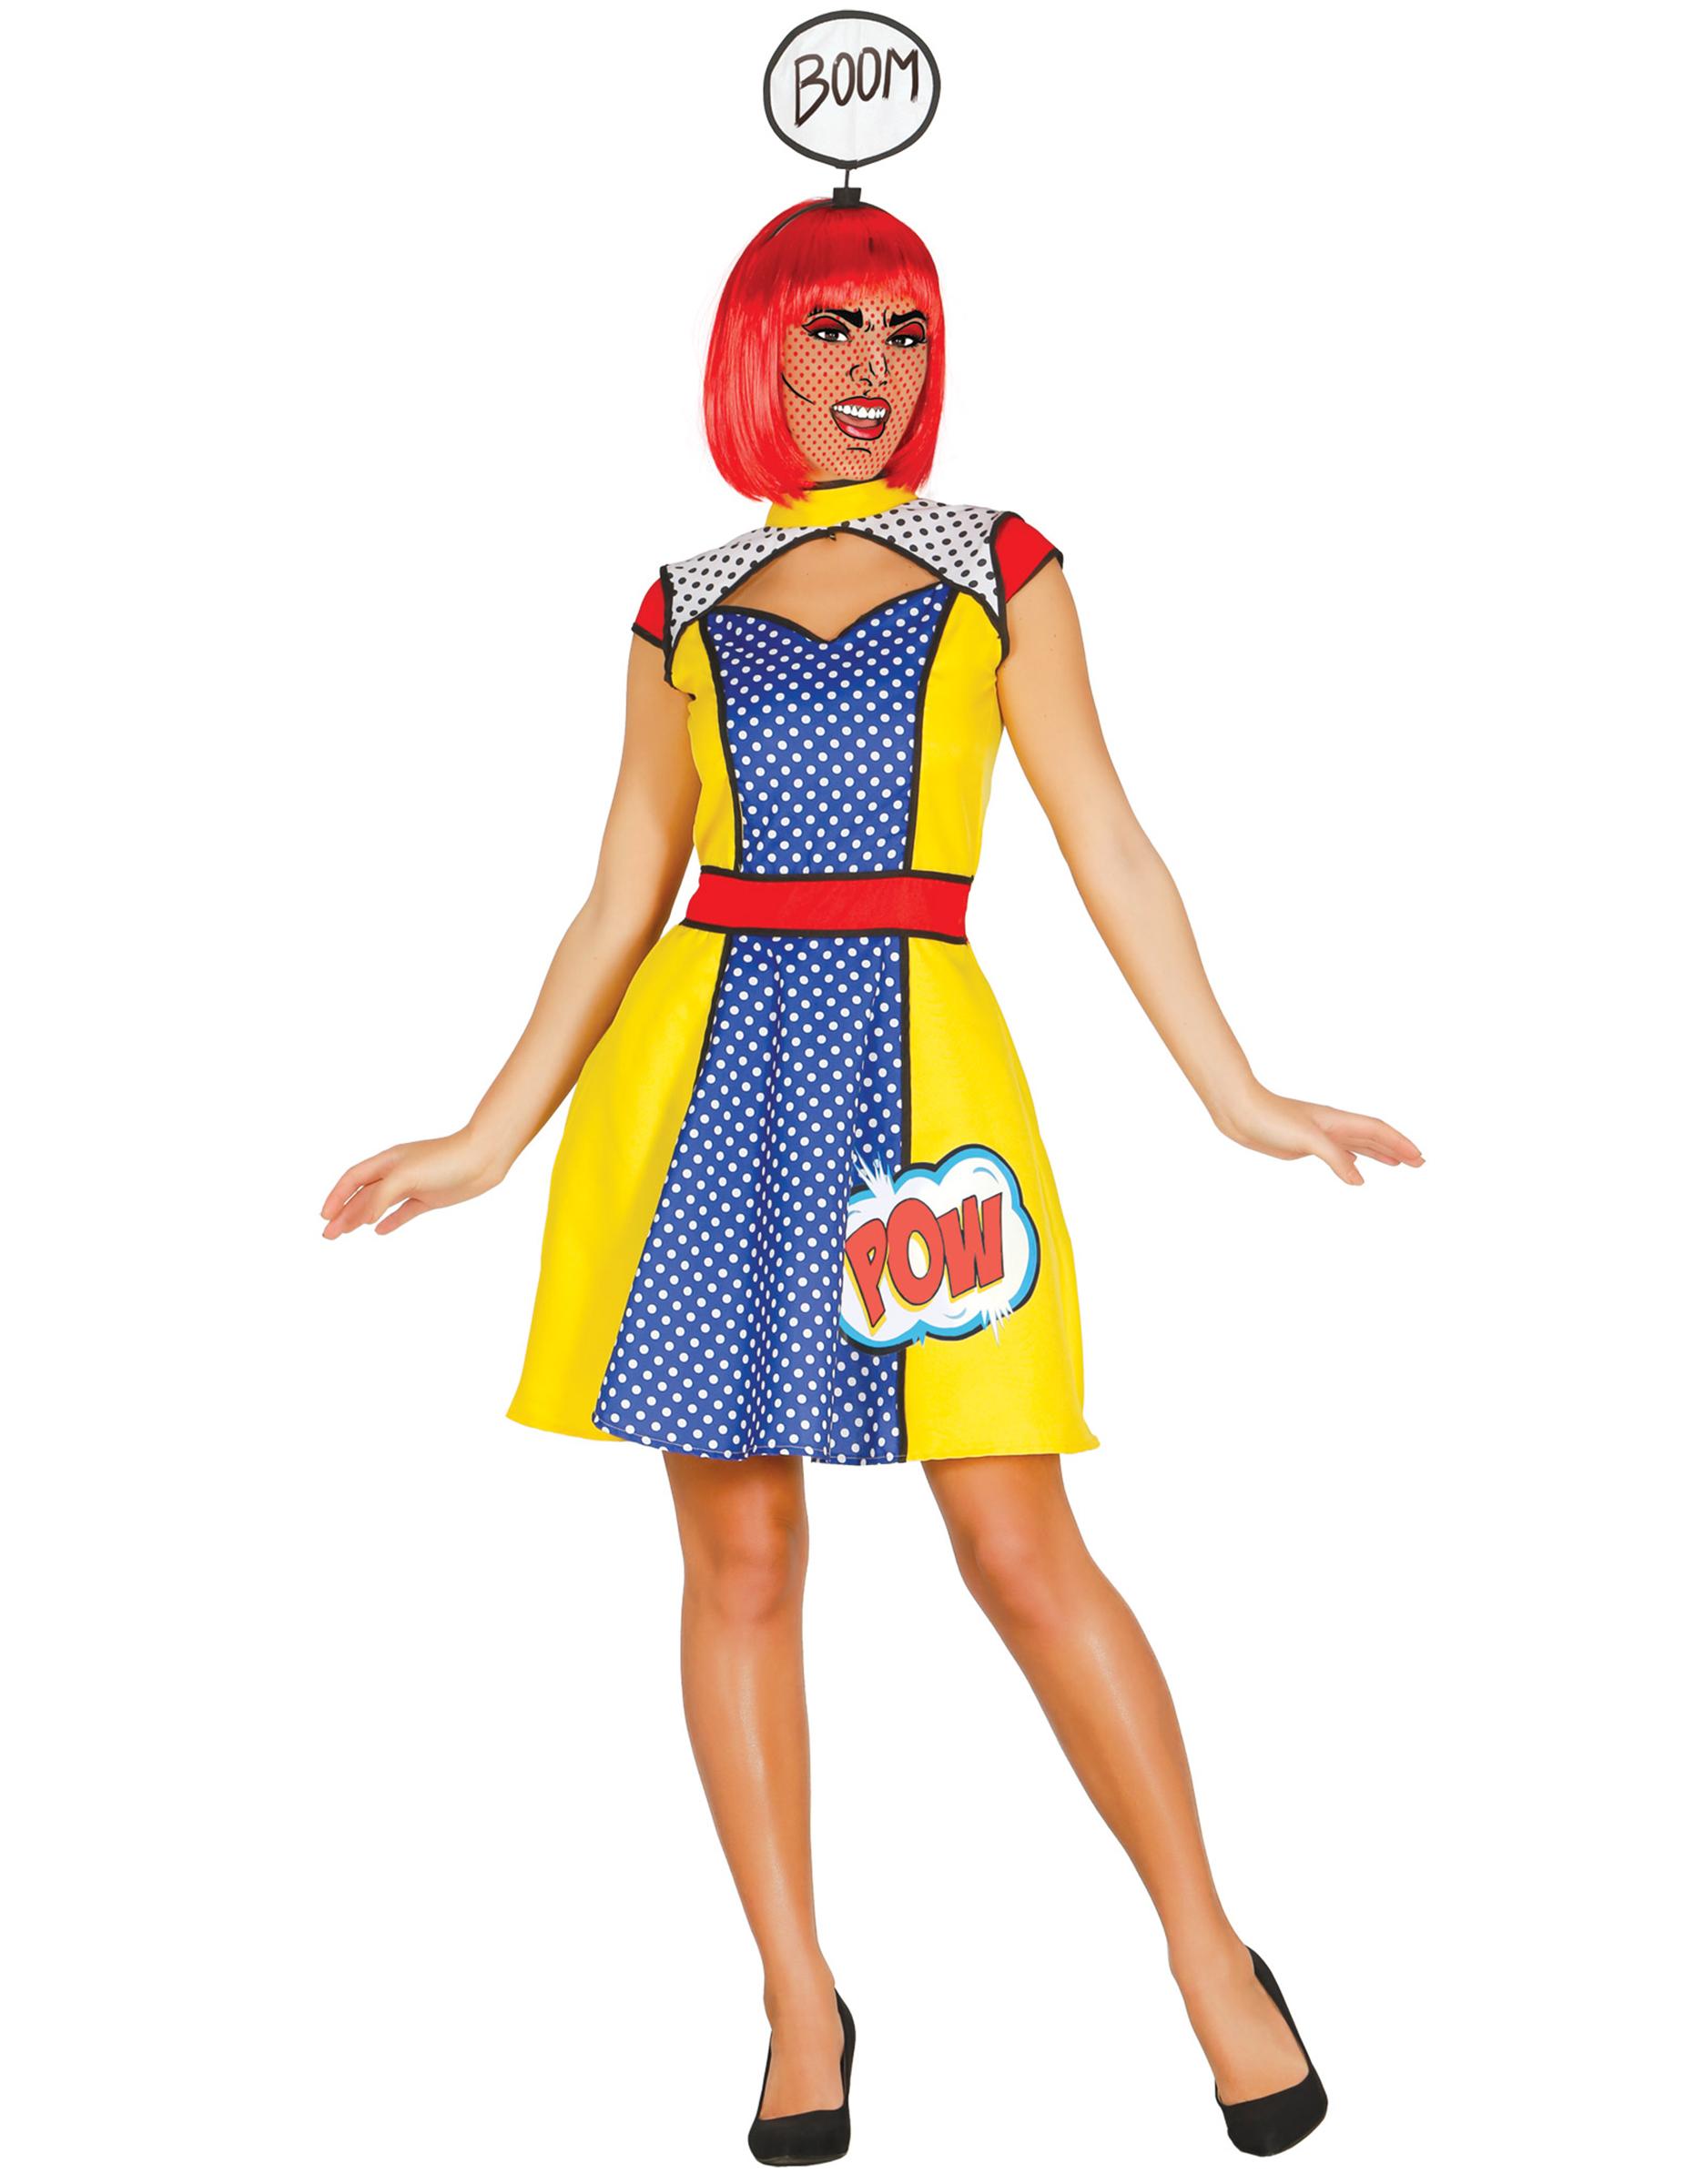 Pop Art Comic Kostum Damen Blau Gelb Gunstige Faschings Kostume